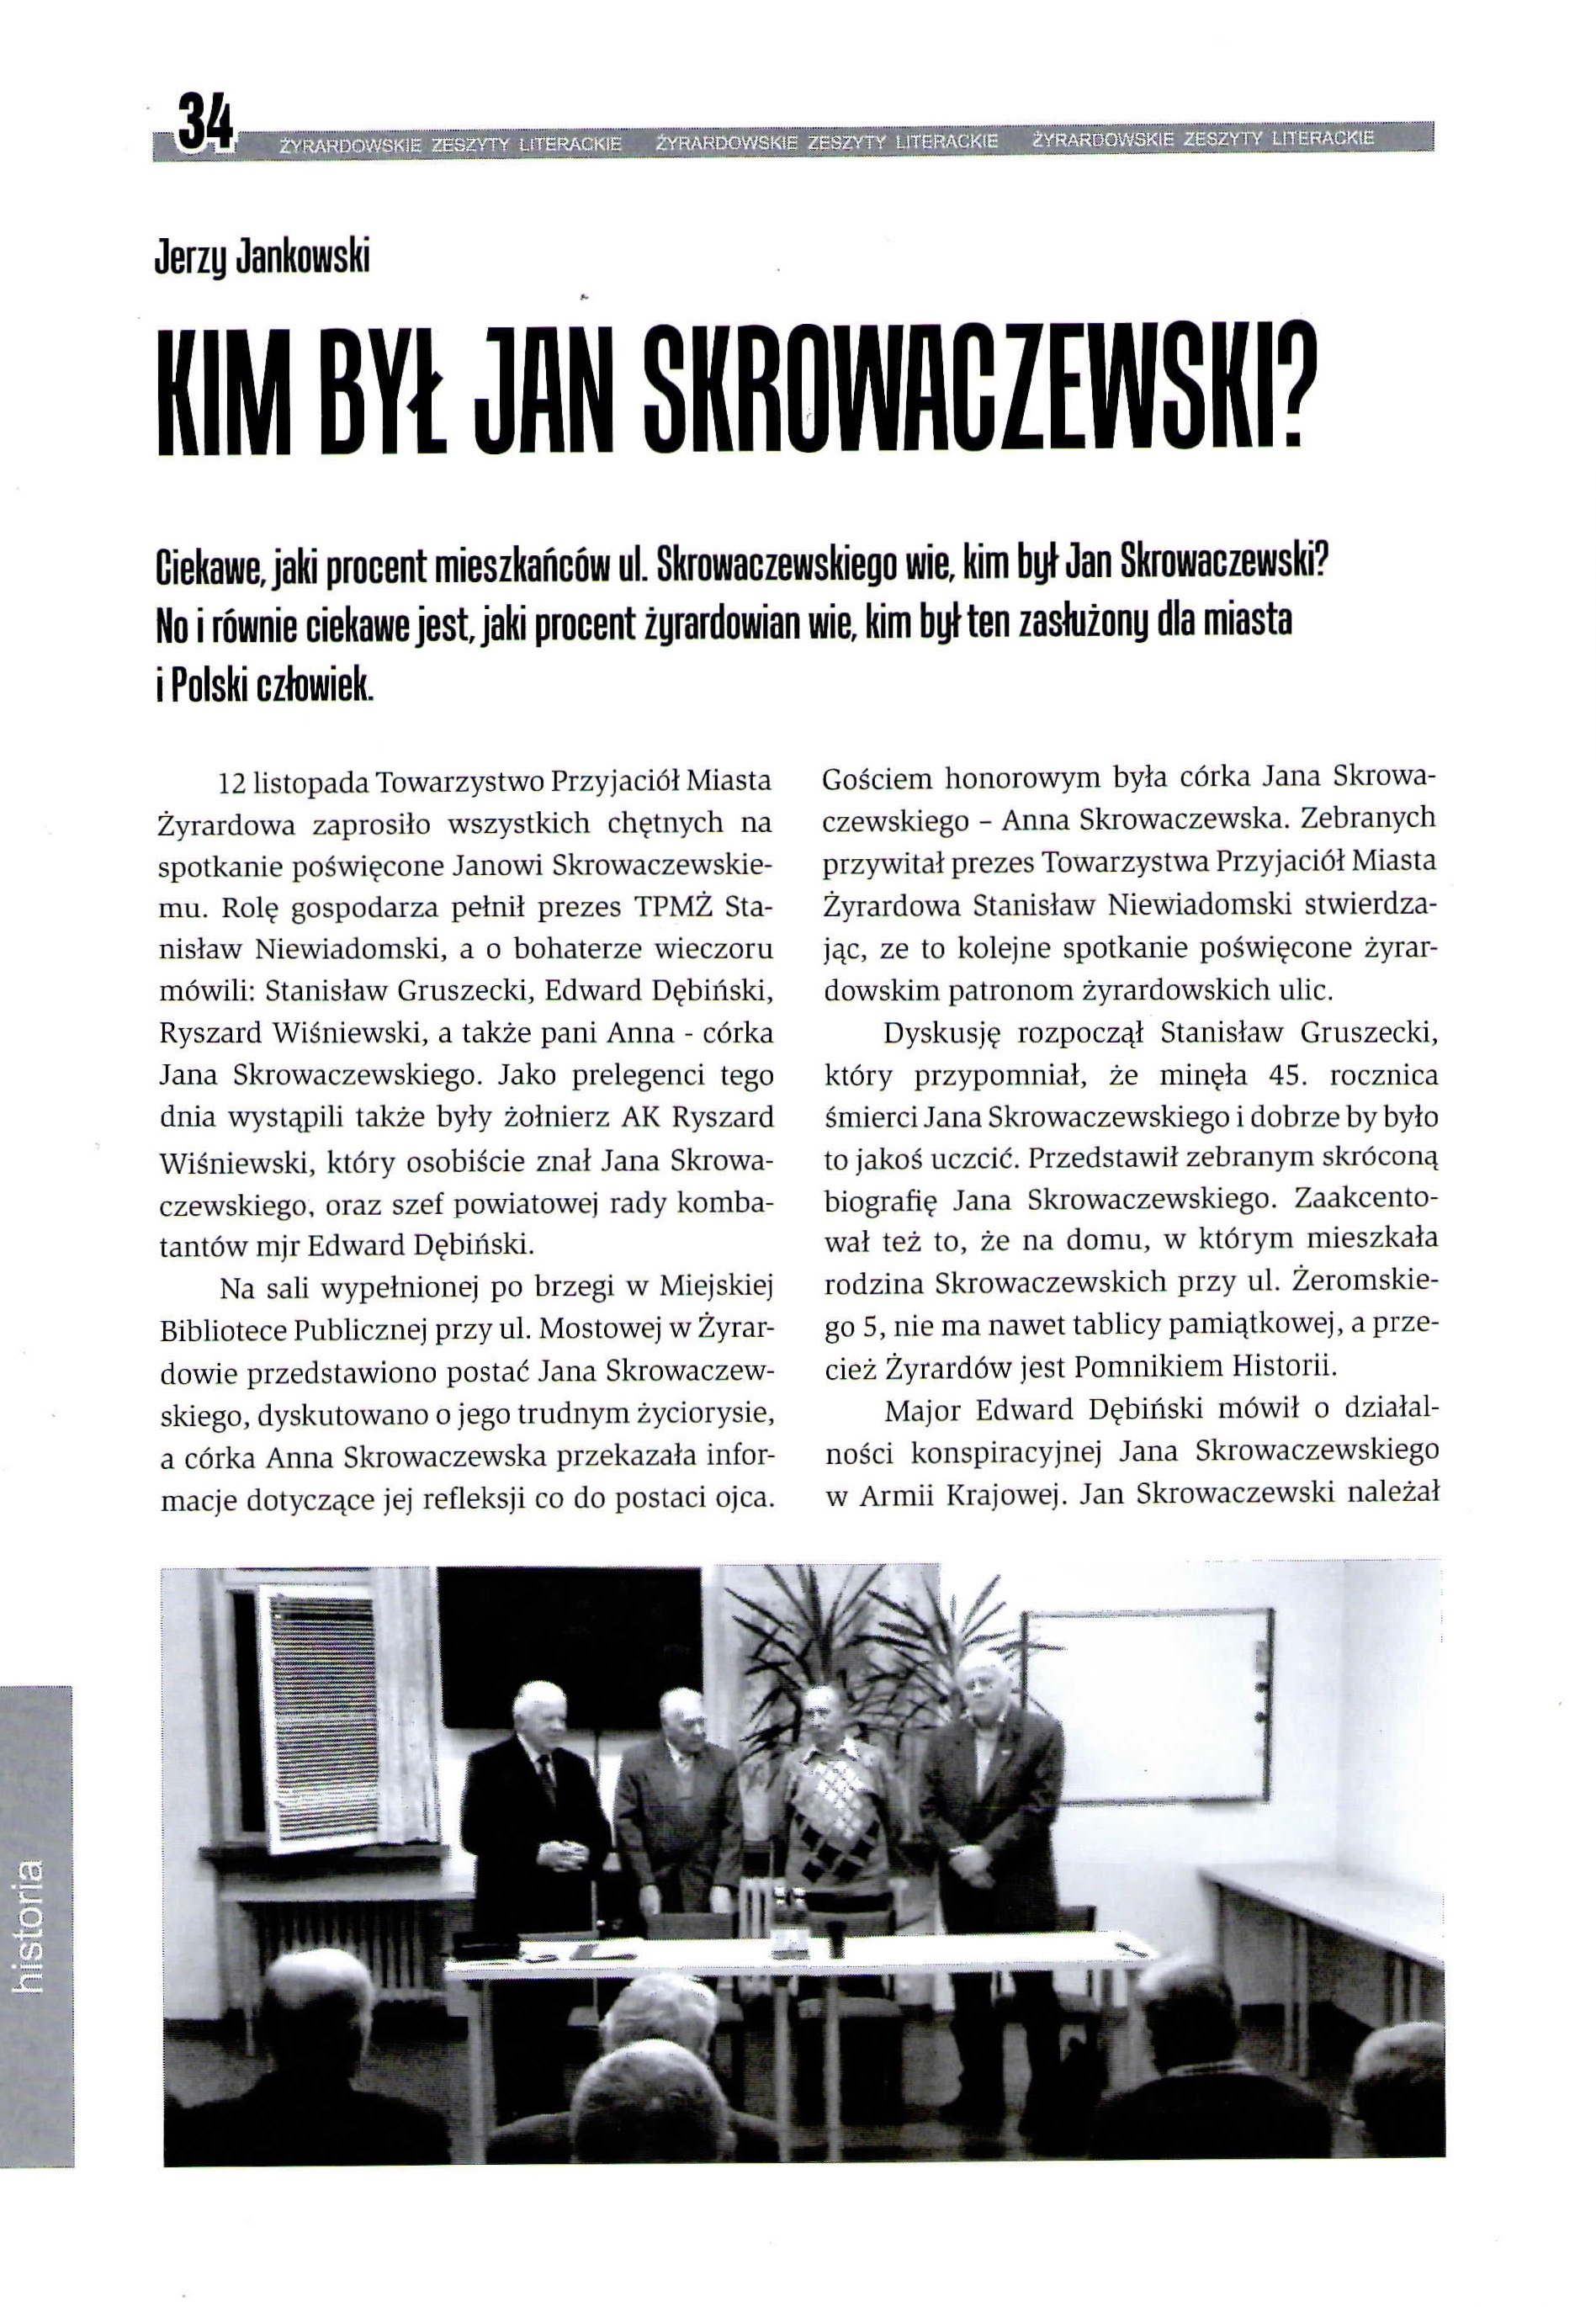 JJ-J.Skrowaczewski ŻZL nr3-0001 2